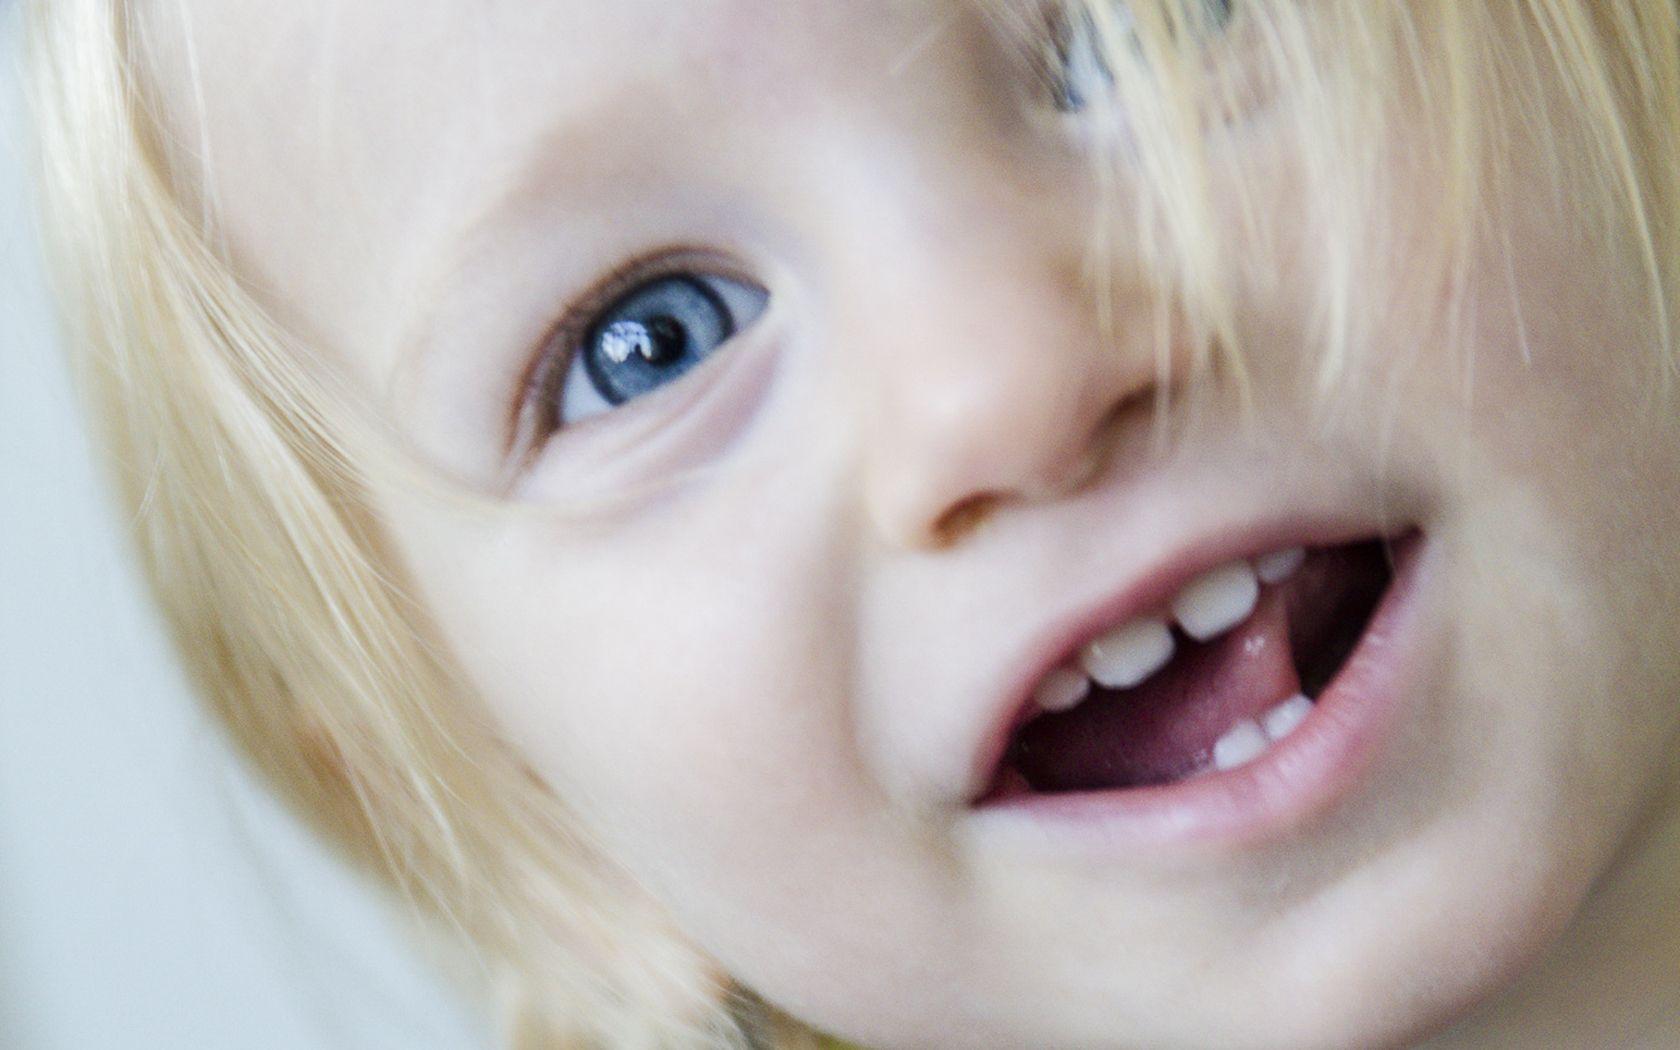 Di sorrisi e primi denti